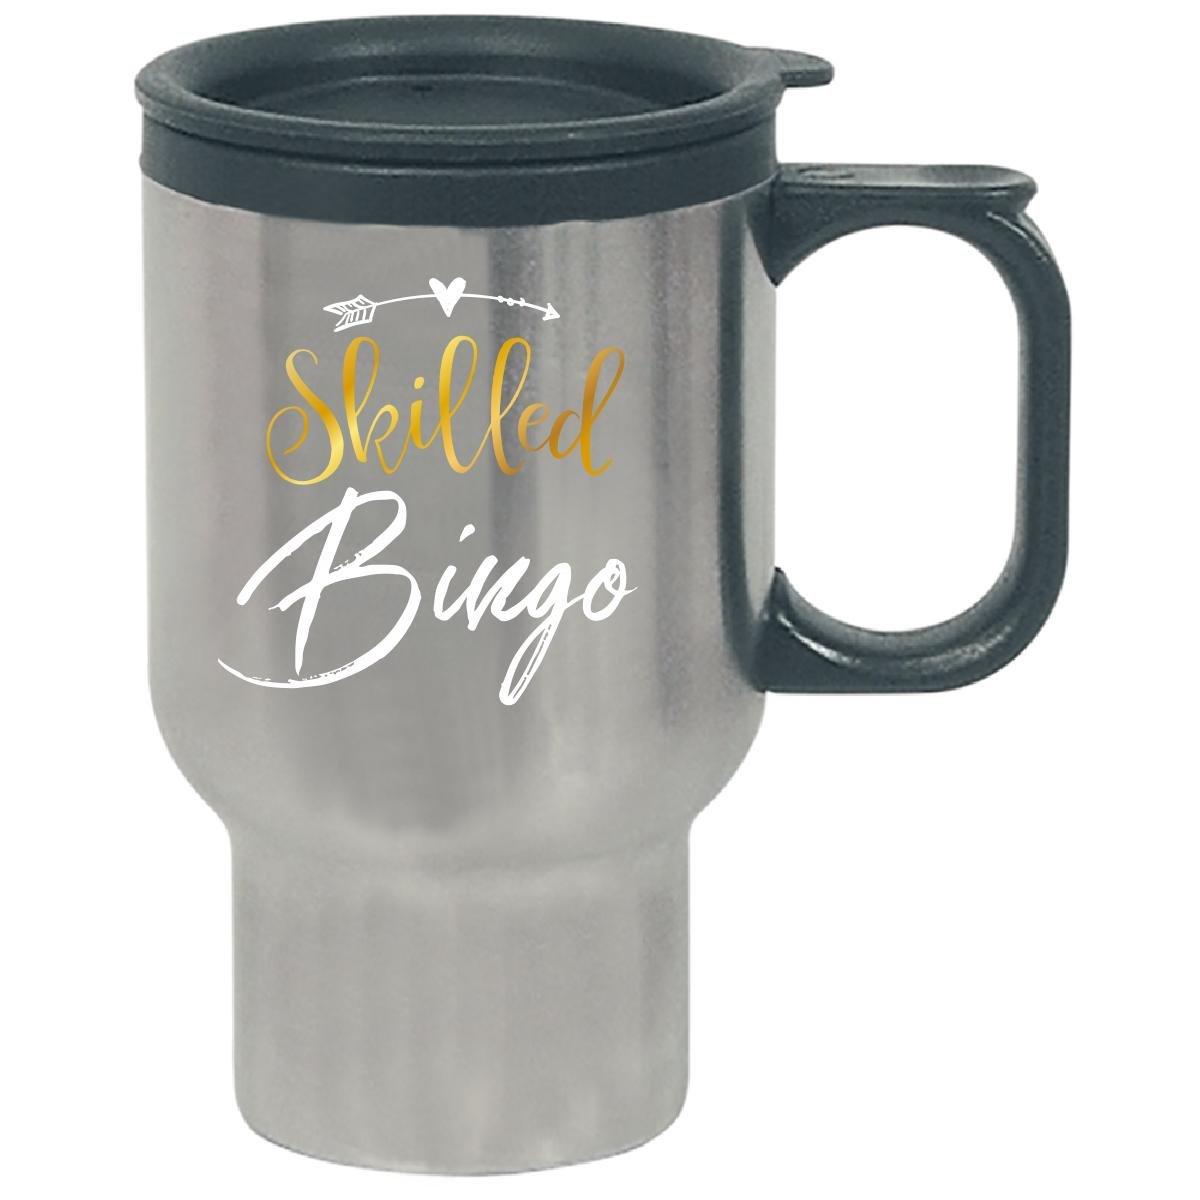 Skilled Bingo Name Gift Mothers Day Present Grandma - Travel Mug by My Family Tee